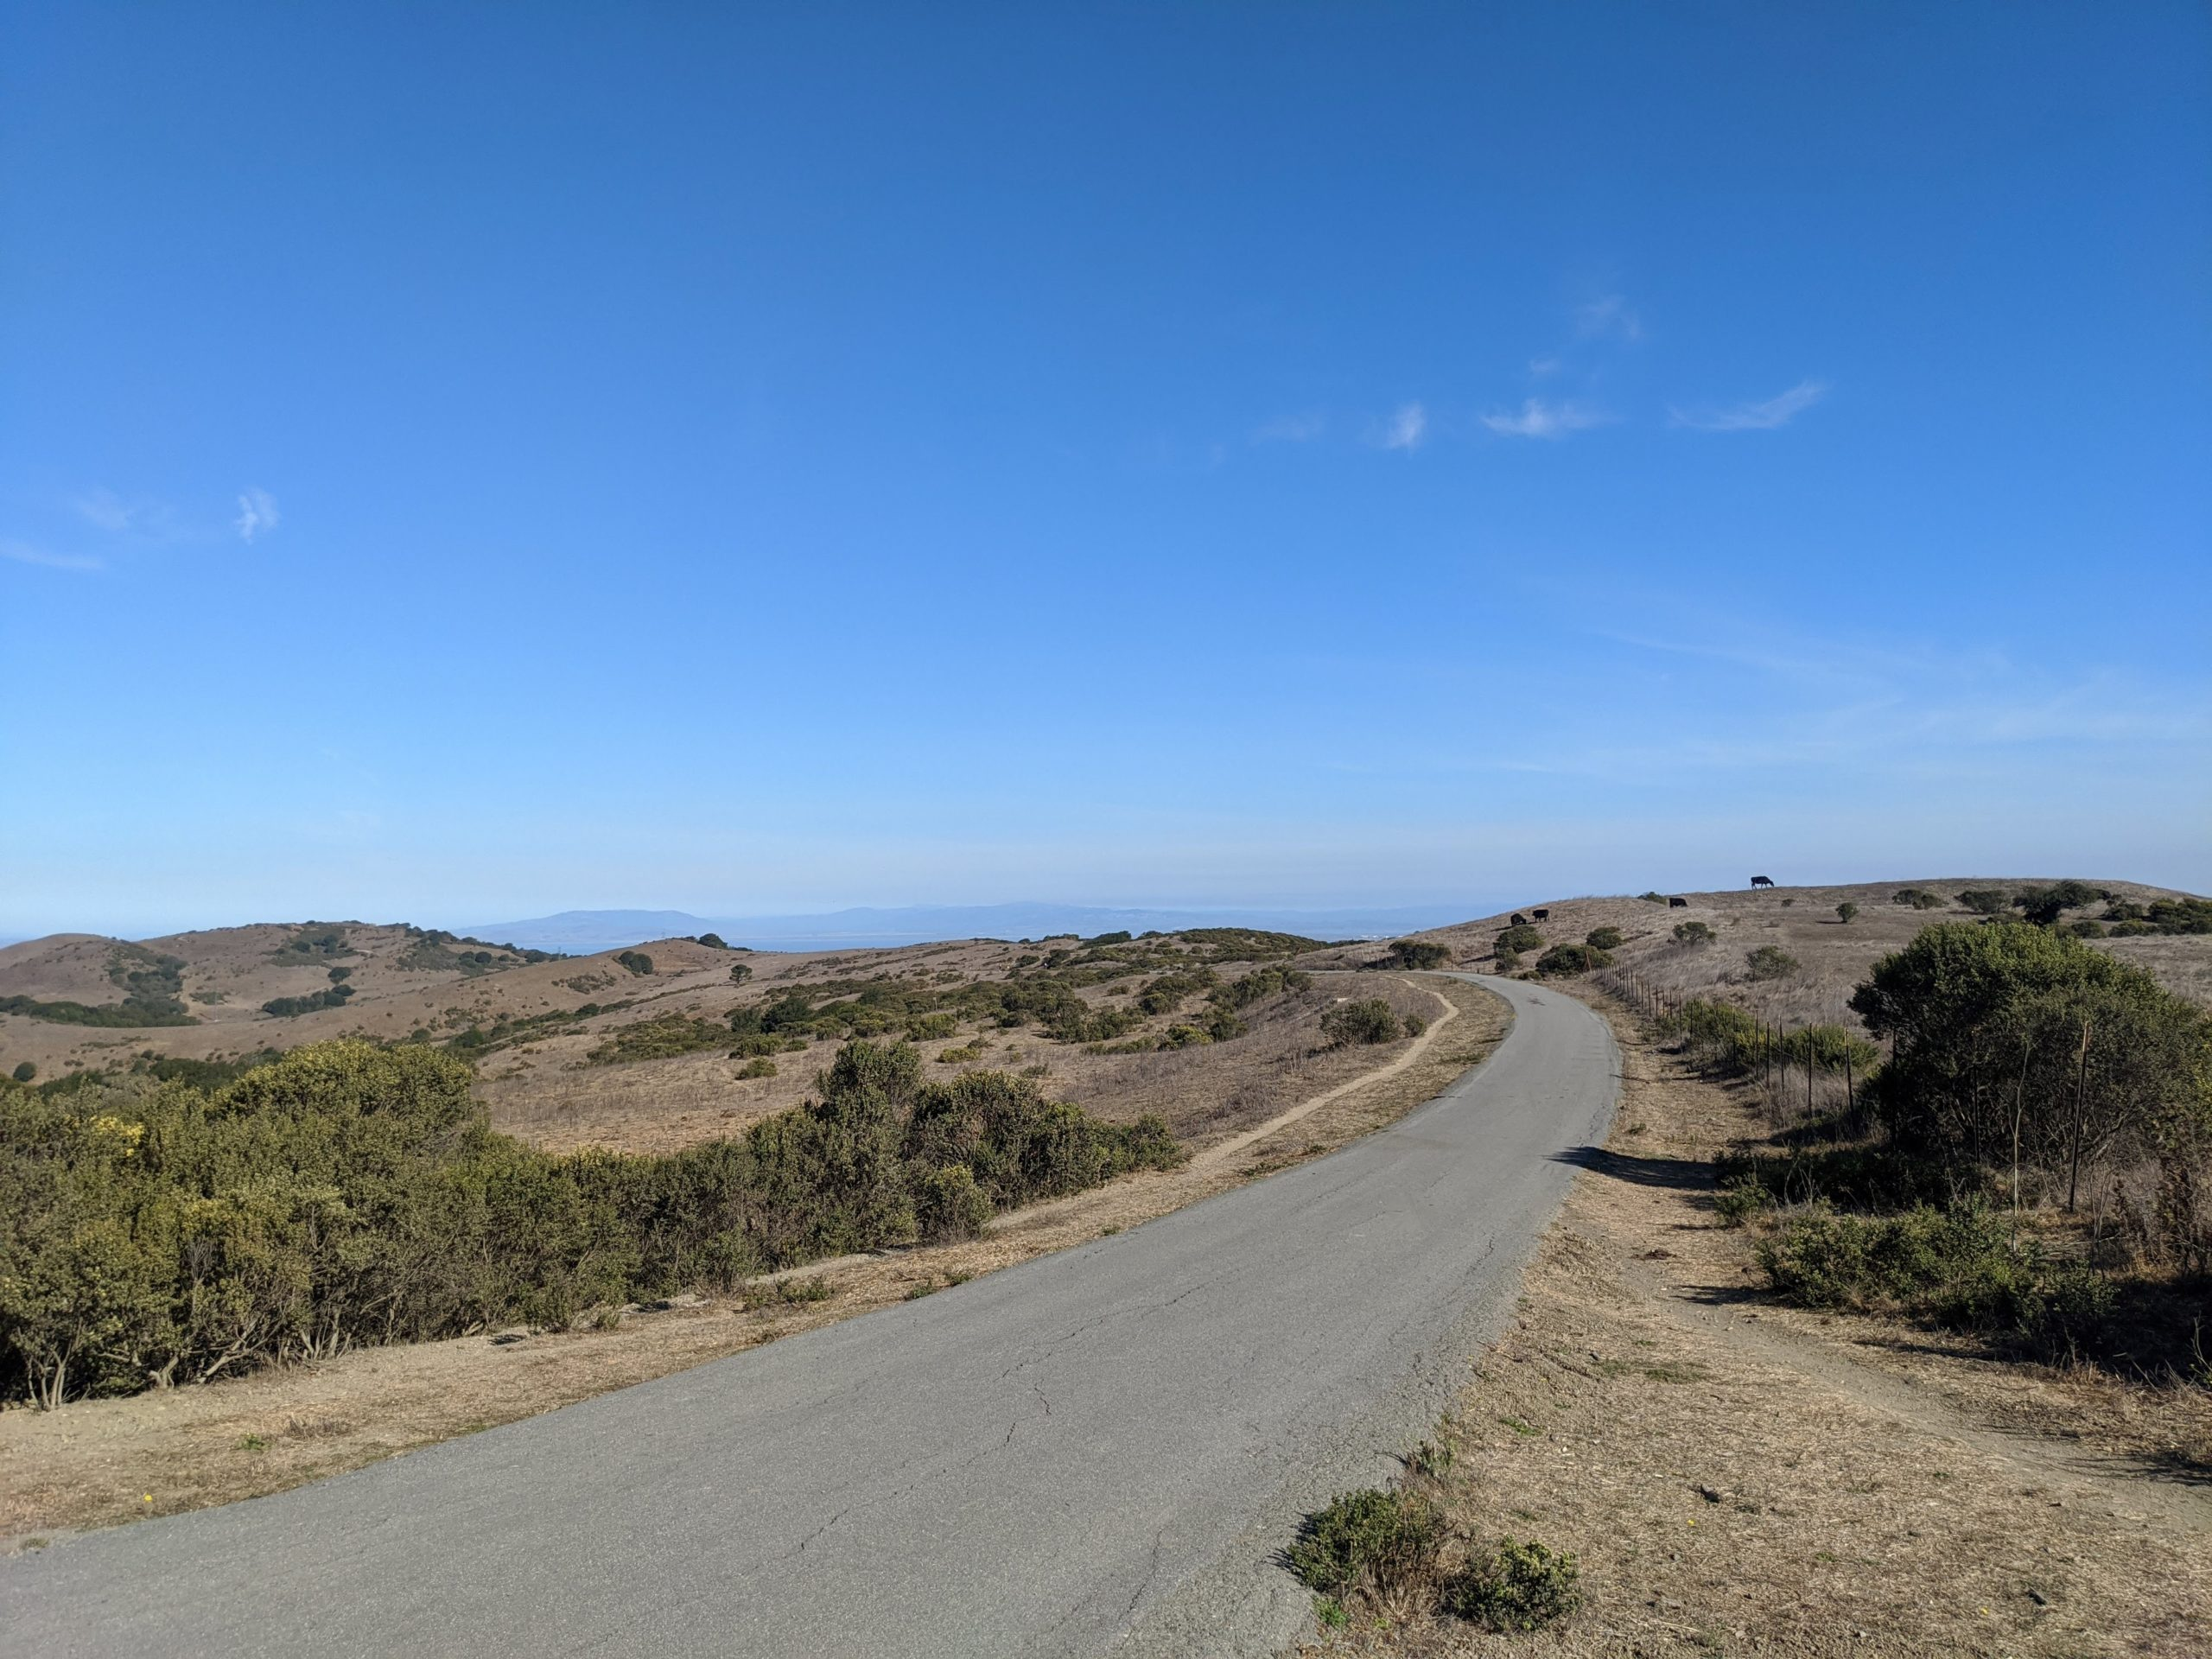 path through grassy hilly meadow